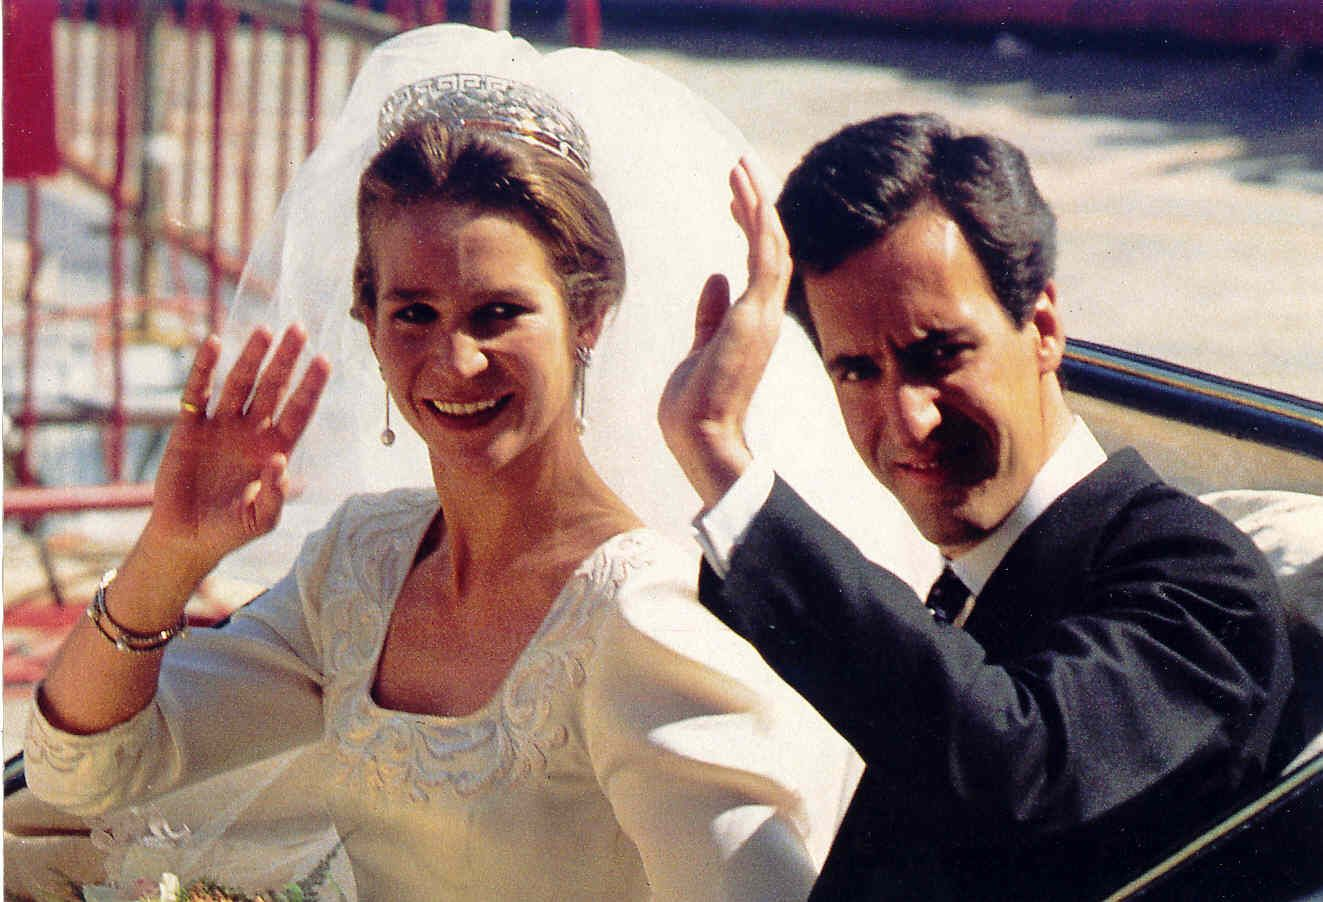 Infanta Elena and Jaime de Marichalar y Sáenz de Tejada waving to the crowd as they leave the church after their wedding ceremony.